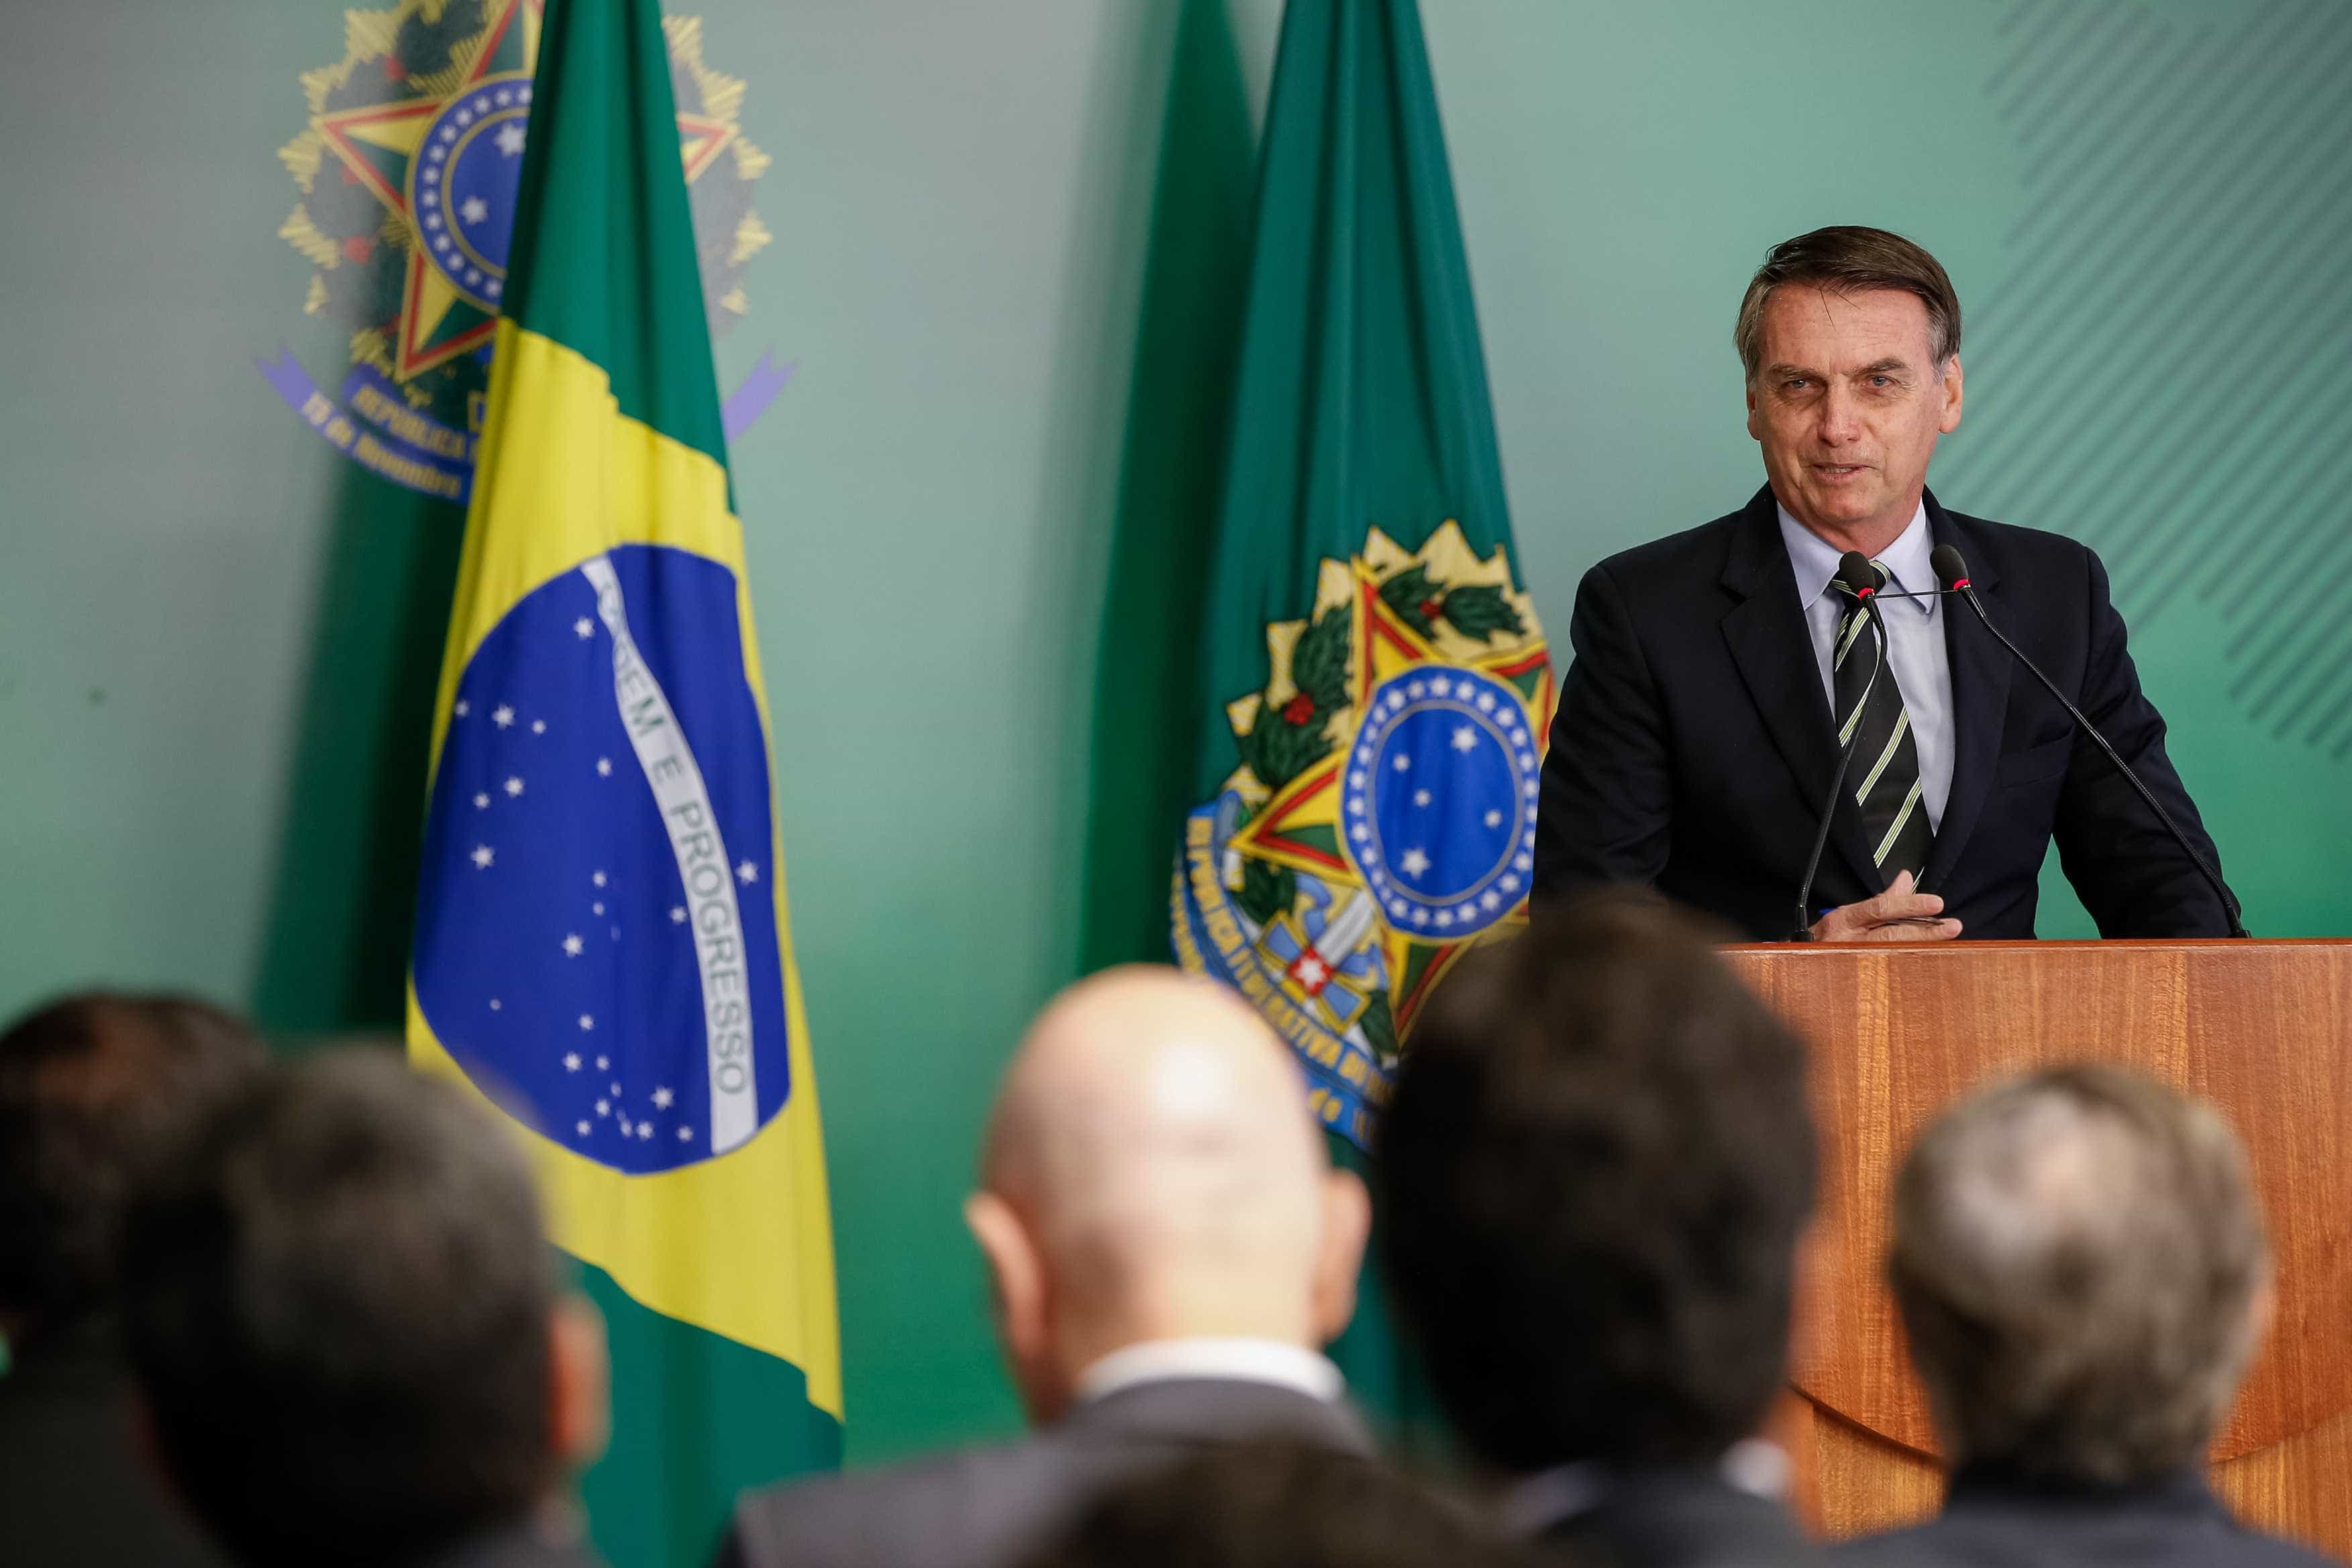 Pró-armas veem timidez em decreto de Bolsonaro